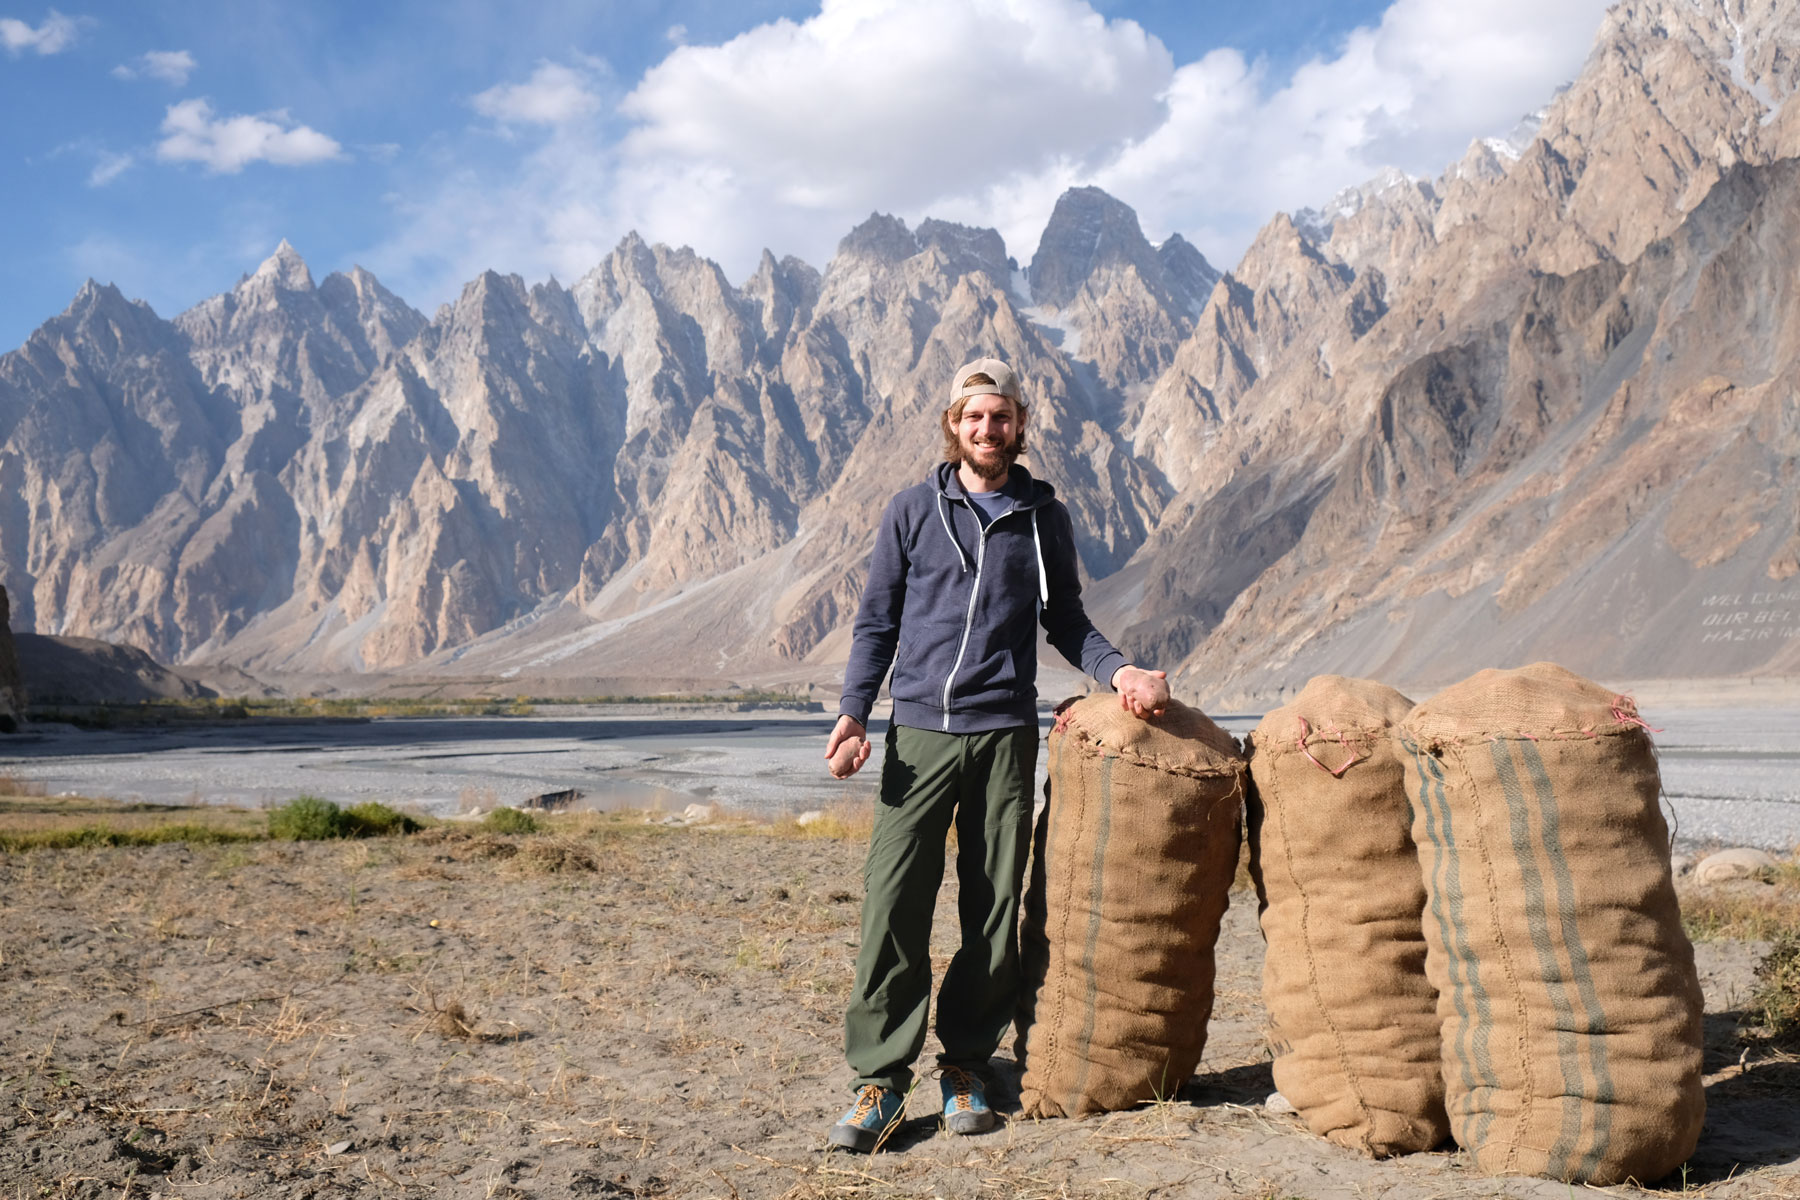 Sebastian neben drei Kartoffelsäcken im pakistanischen Karakorum.